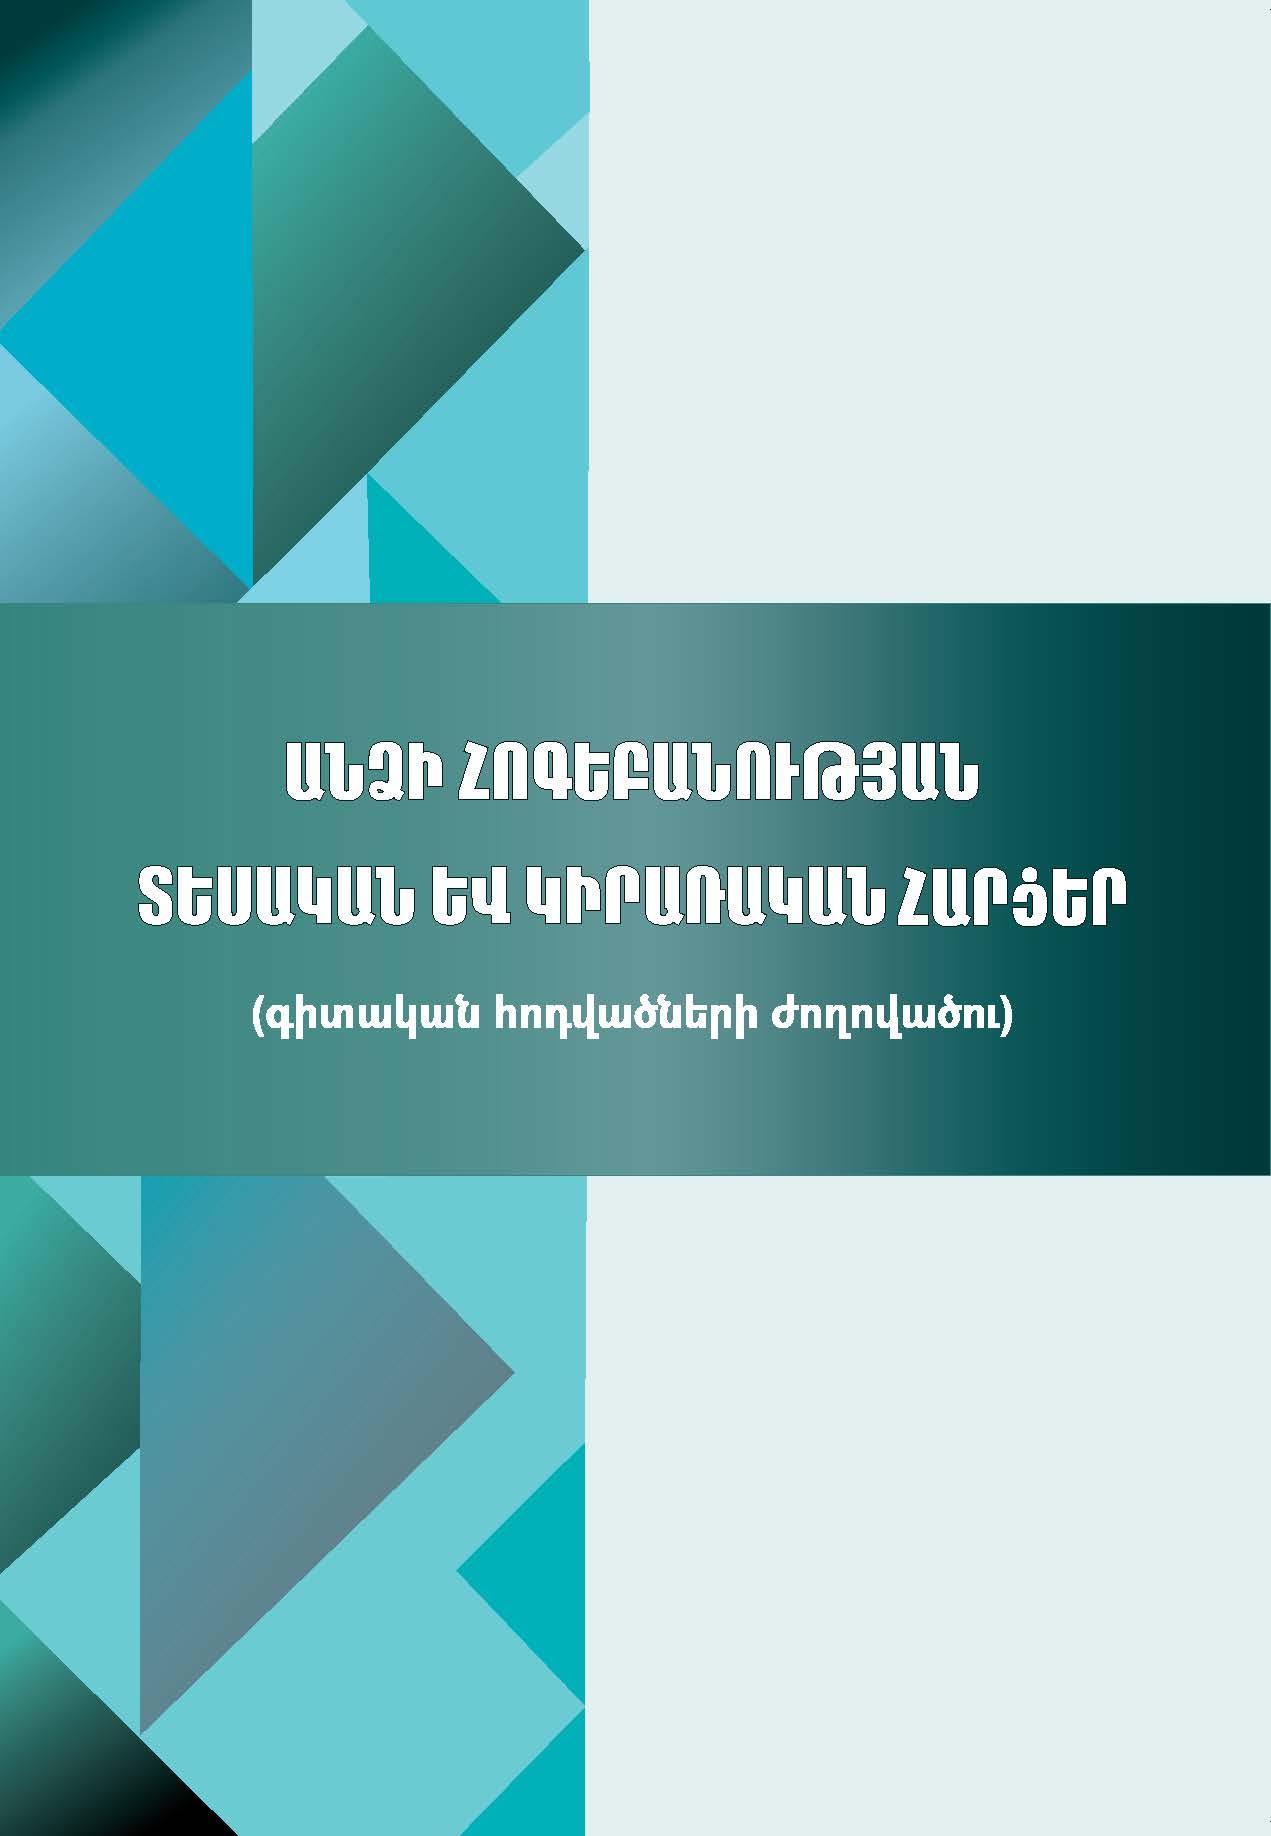 Pages from Andzi hogebanutyan tesakan ev kirarakan harcer (24) - Copy